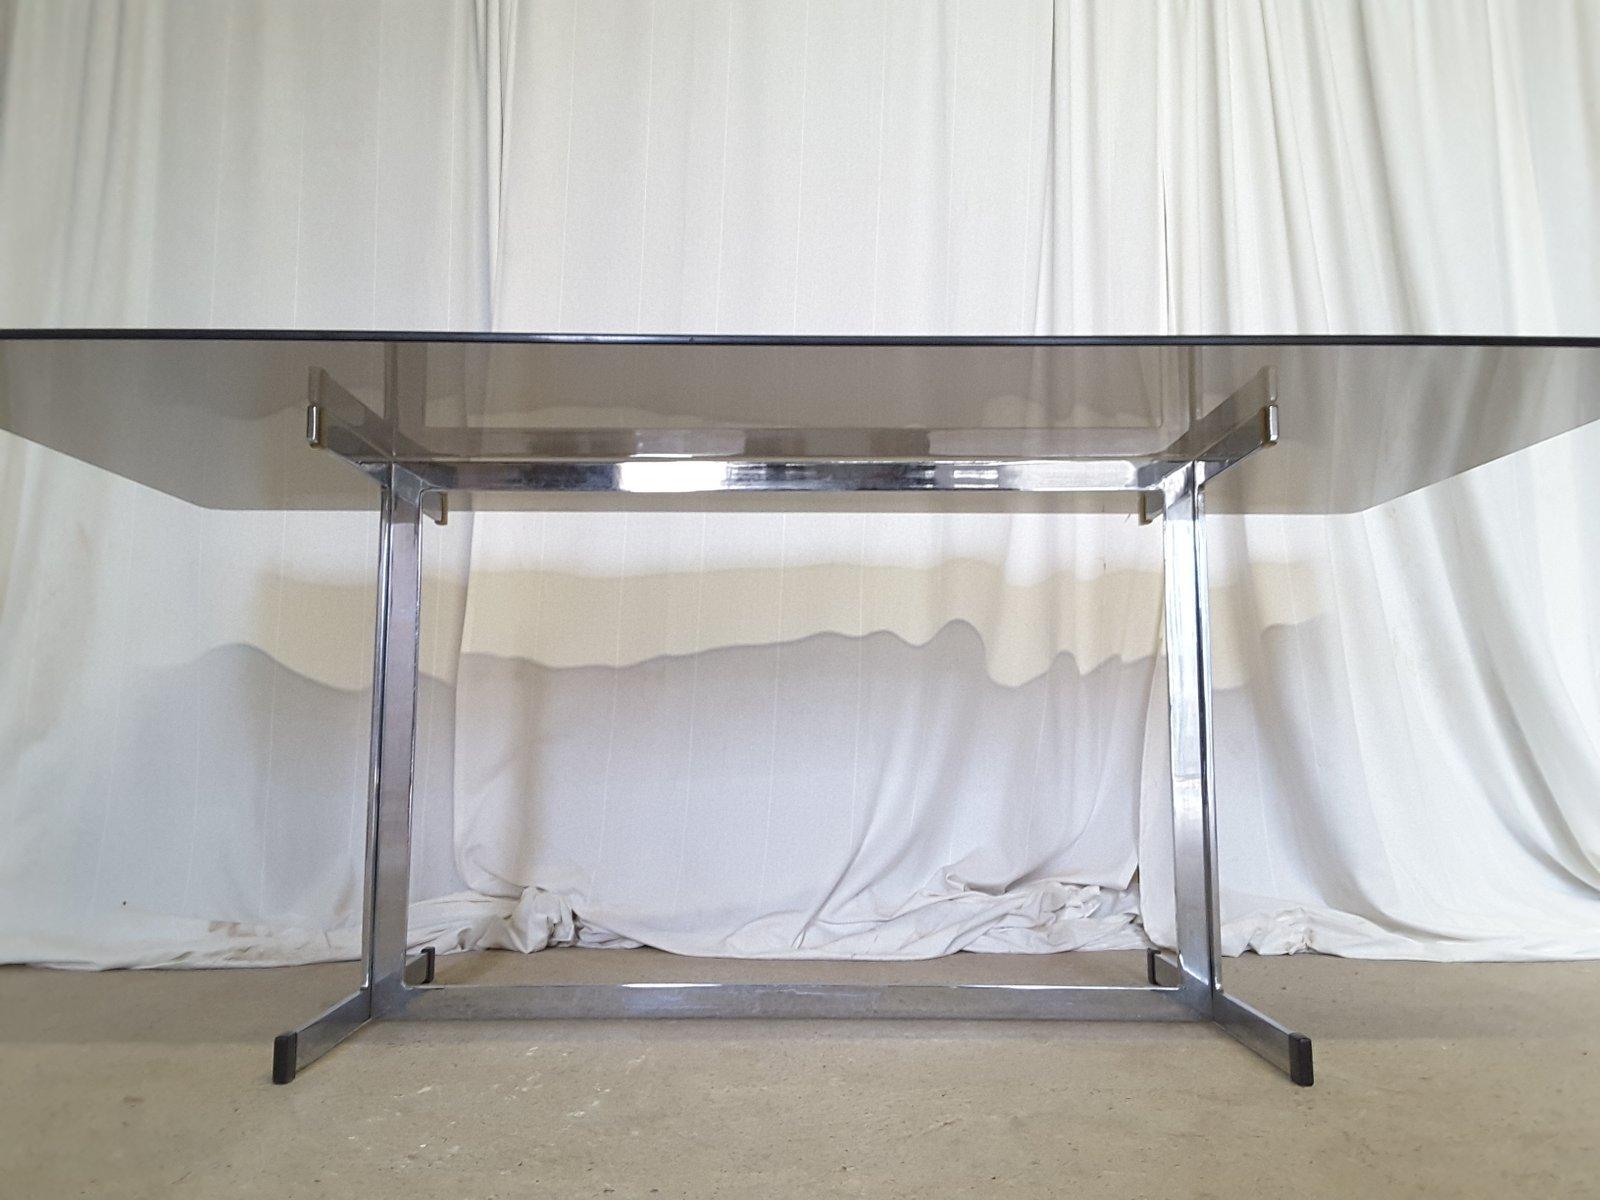 grande table de salle manger en chrome par tim bates pour pieff de worcester angleterre. Black Bedroom Furniture Sets. Home Design Ideas